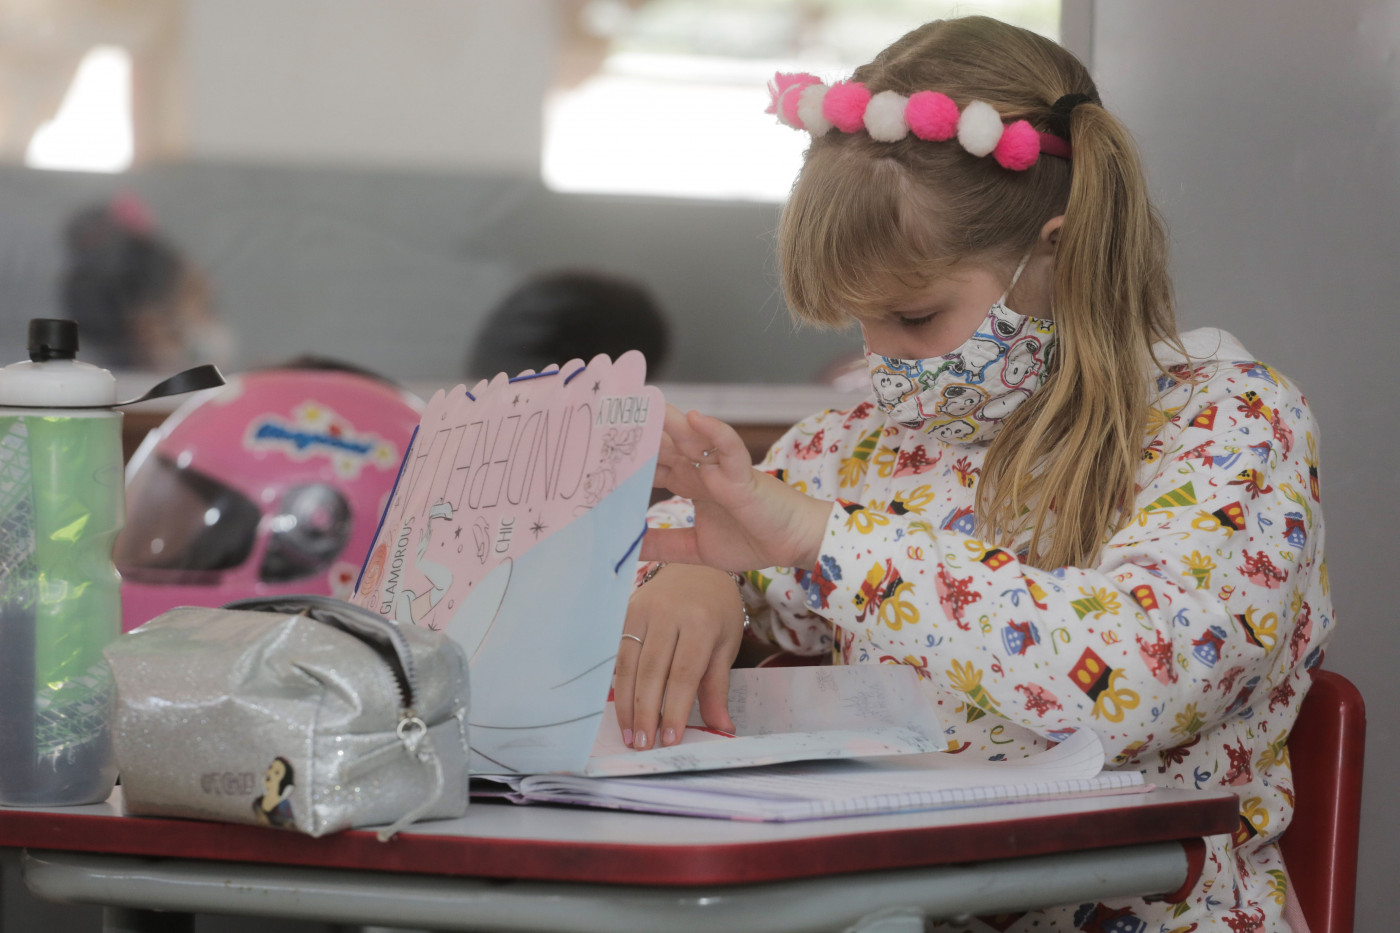 Menina loira mexe em caderno